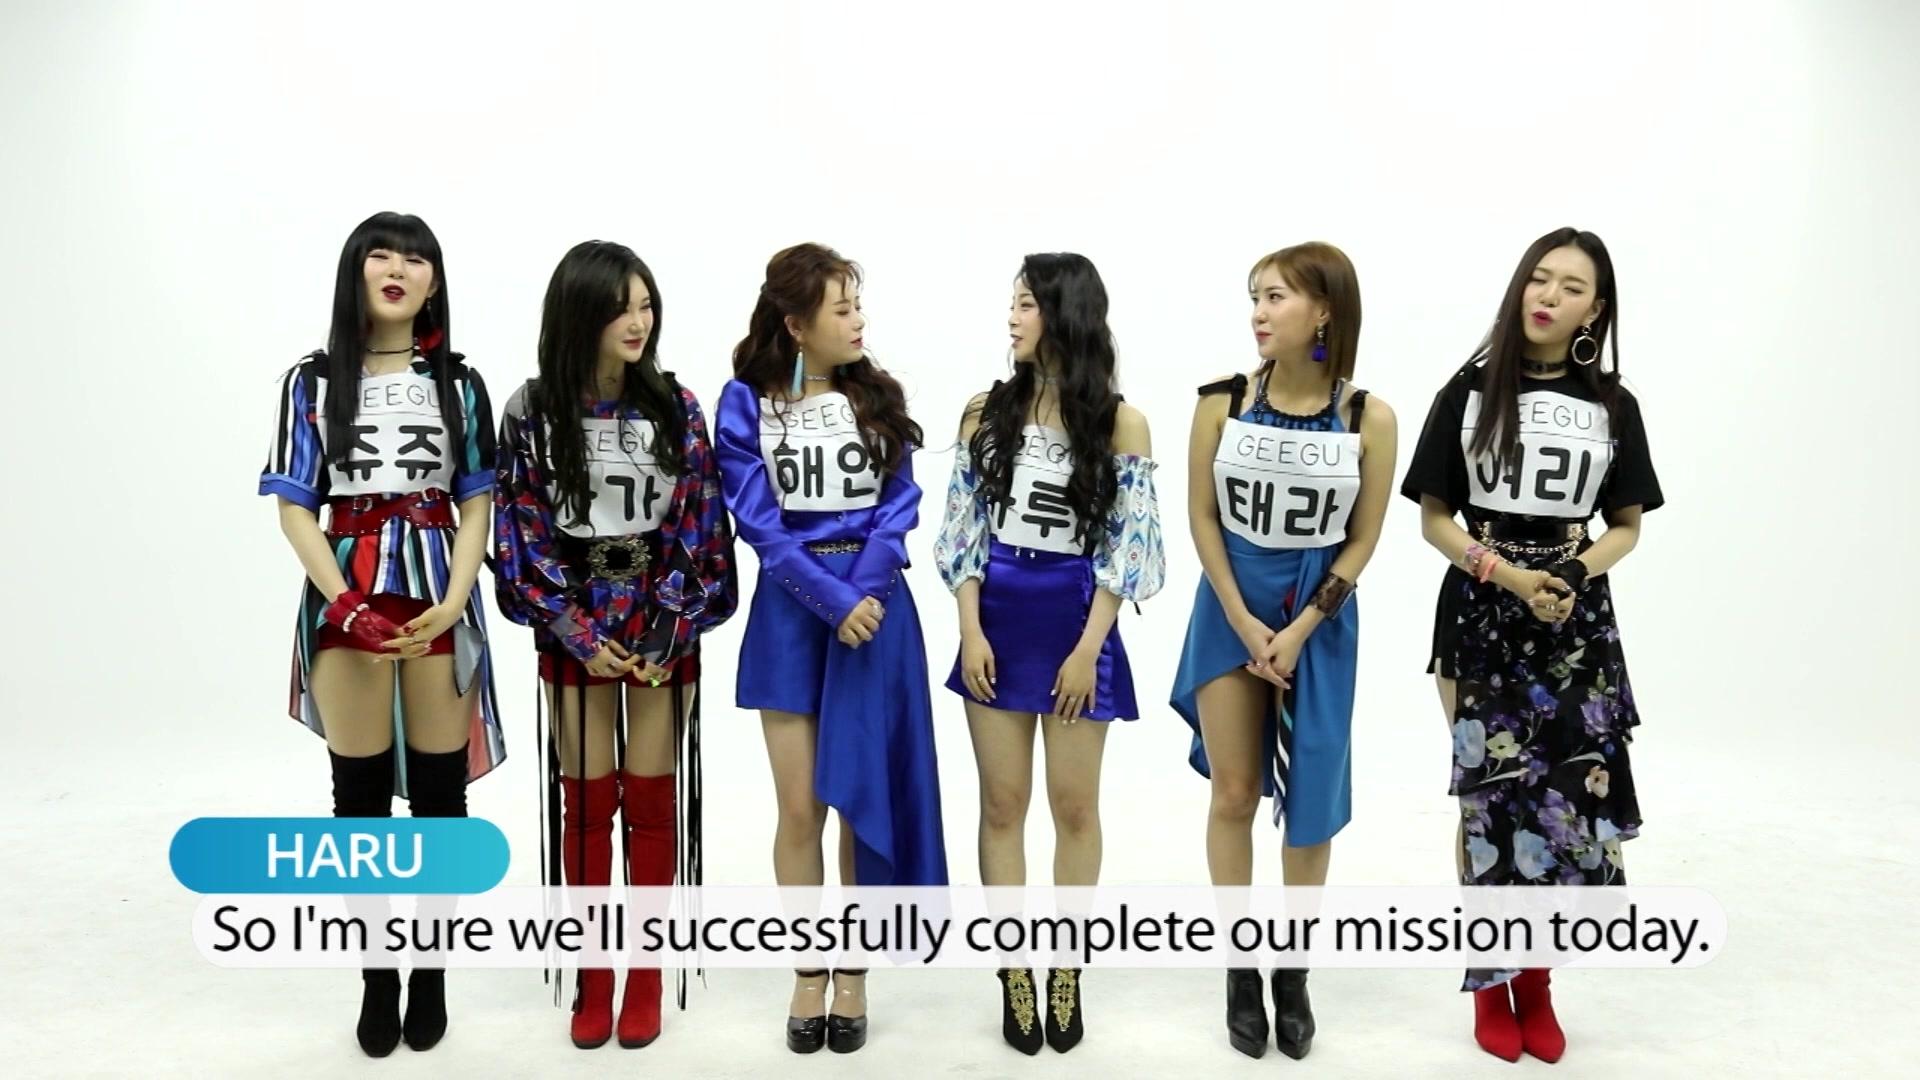 Pops in Seoul Episode 3951: Moonlight(문라이트) ! GeeGu(지구)'s Off-Stage Dance